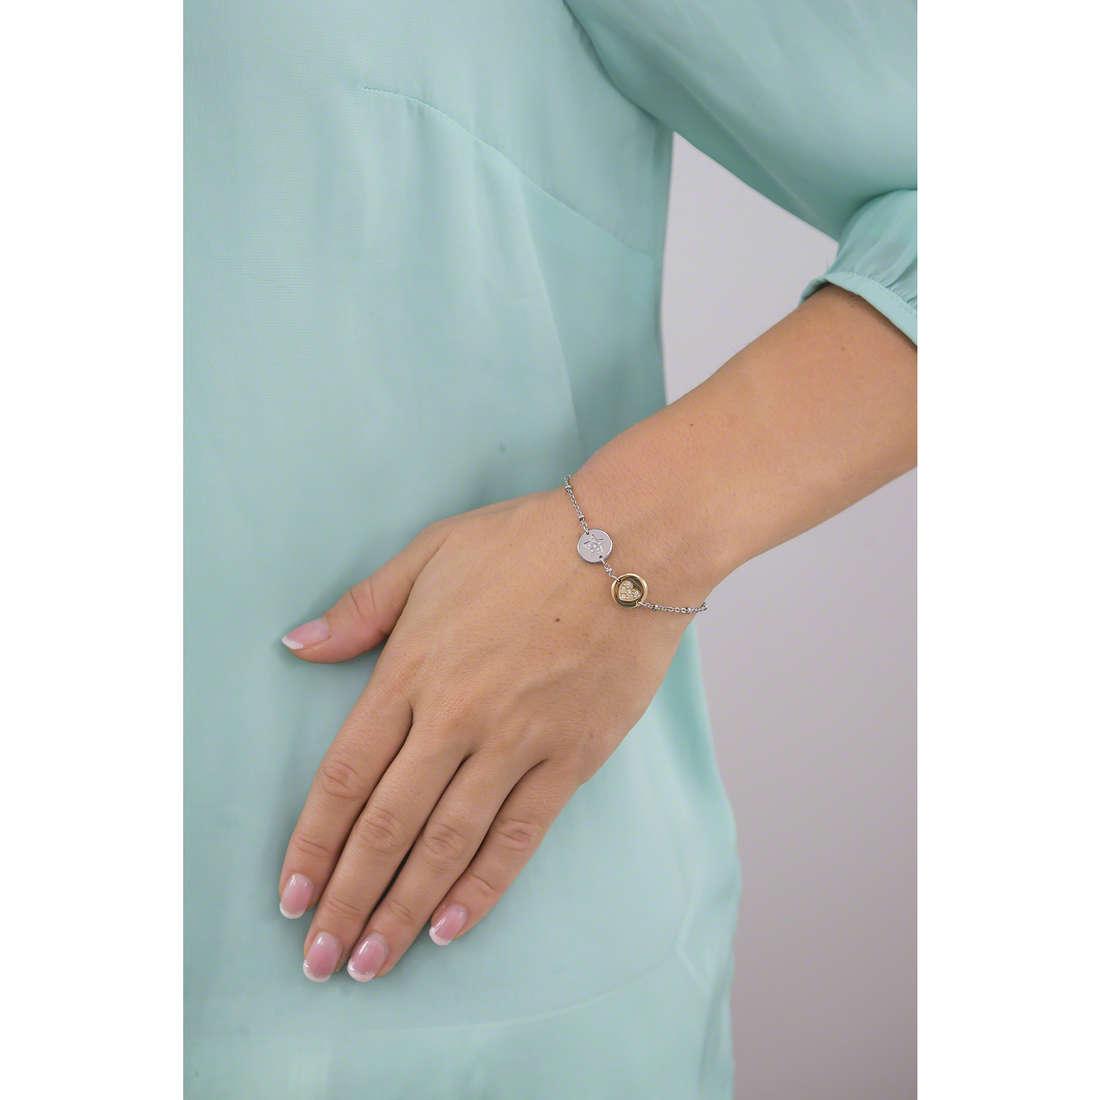 Morellato bracciali Monetine donna SAHQ07 indosso